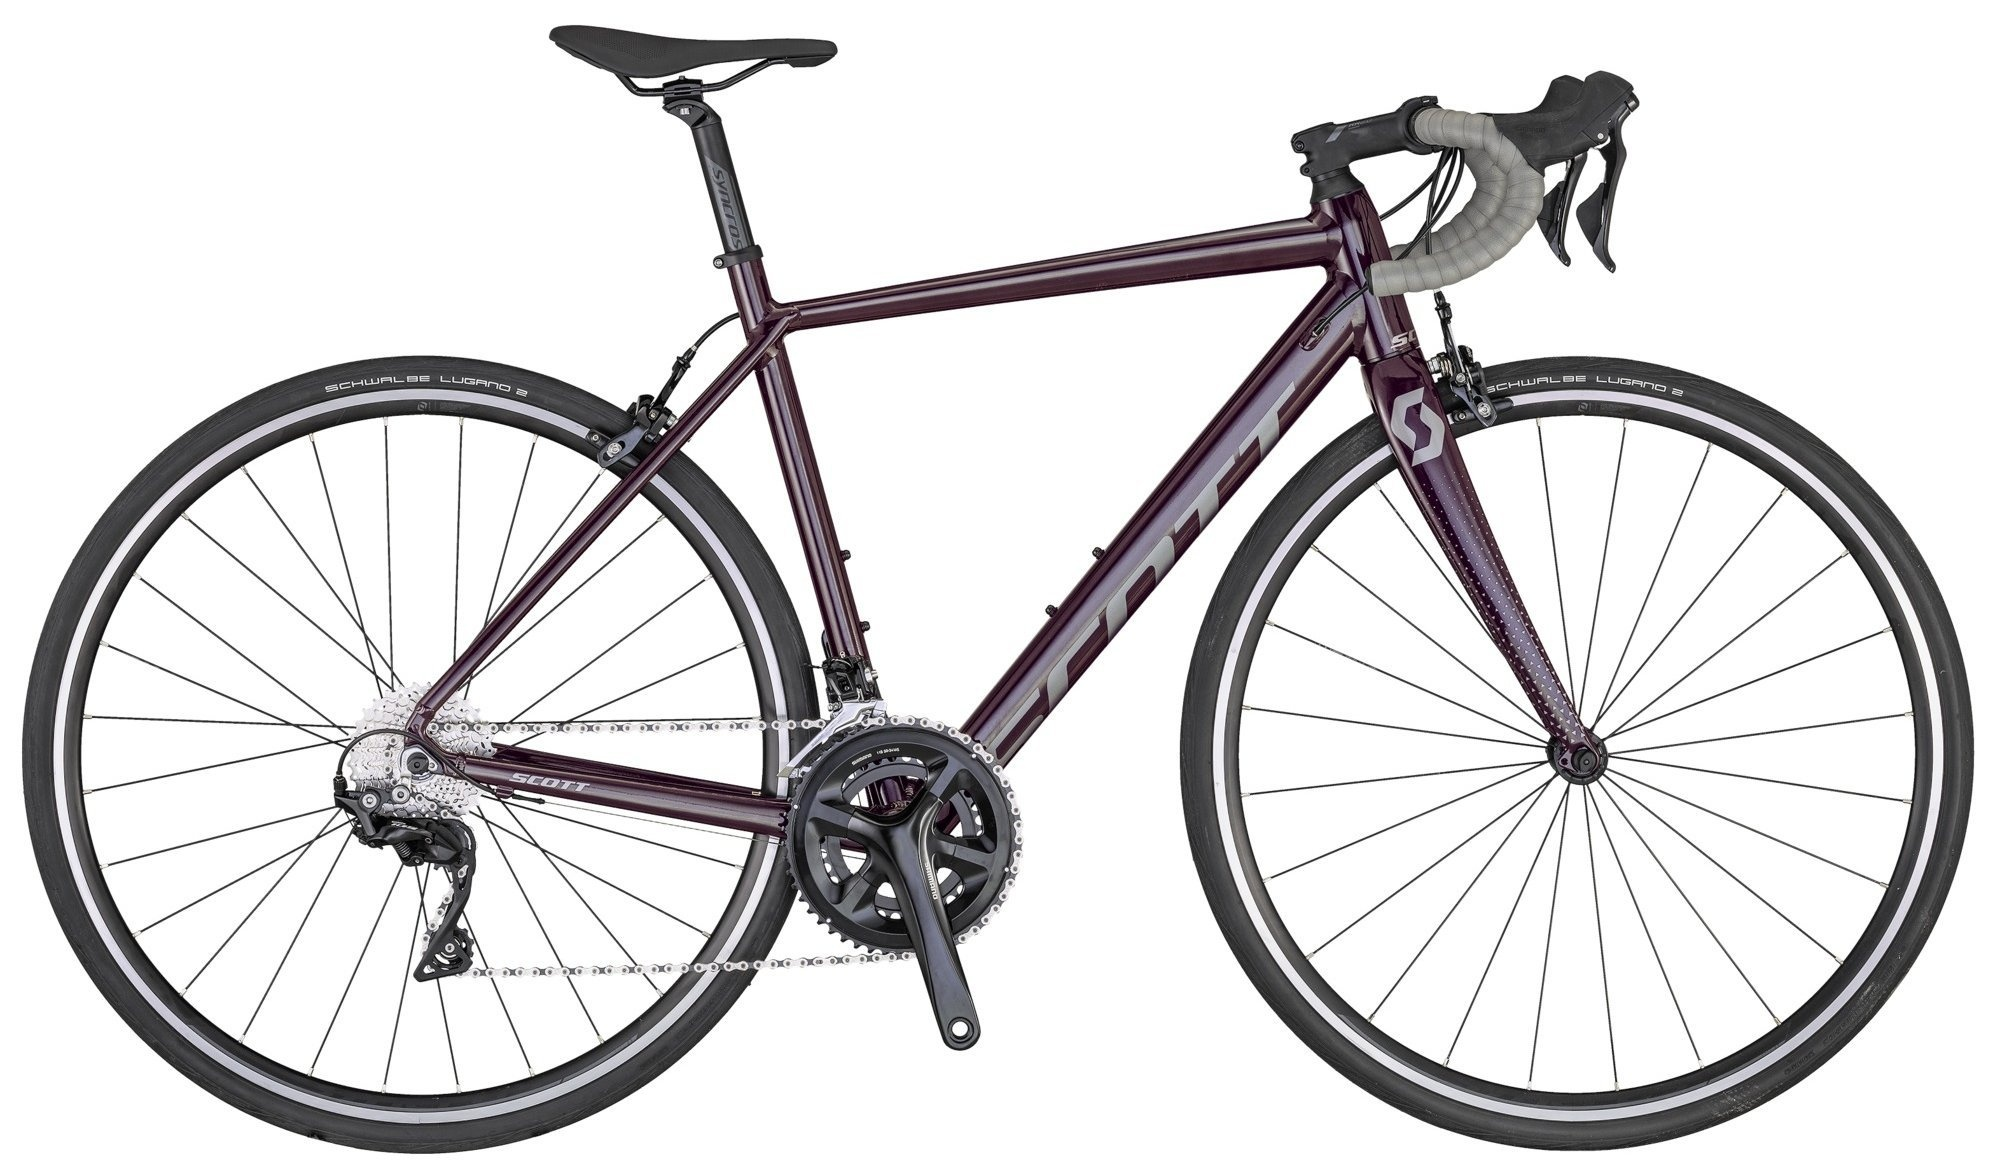 Scott Scott Contessa Speedster 15 2020 Cykler > Racercykler